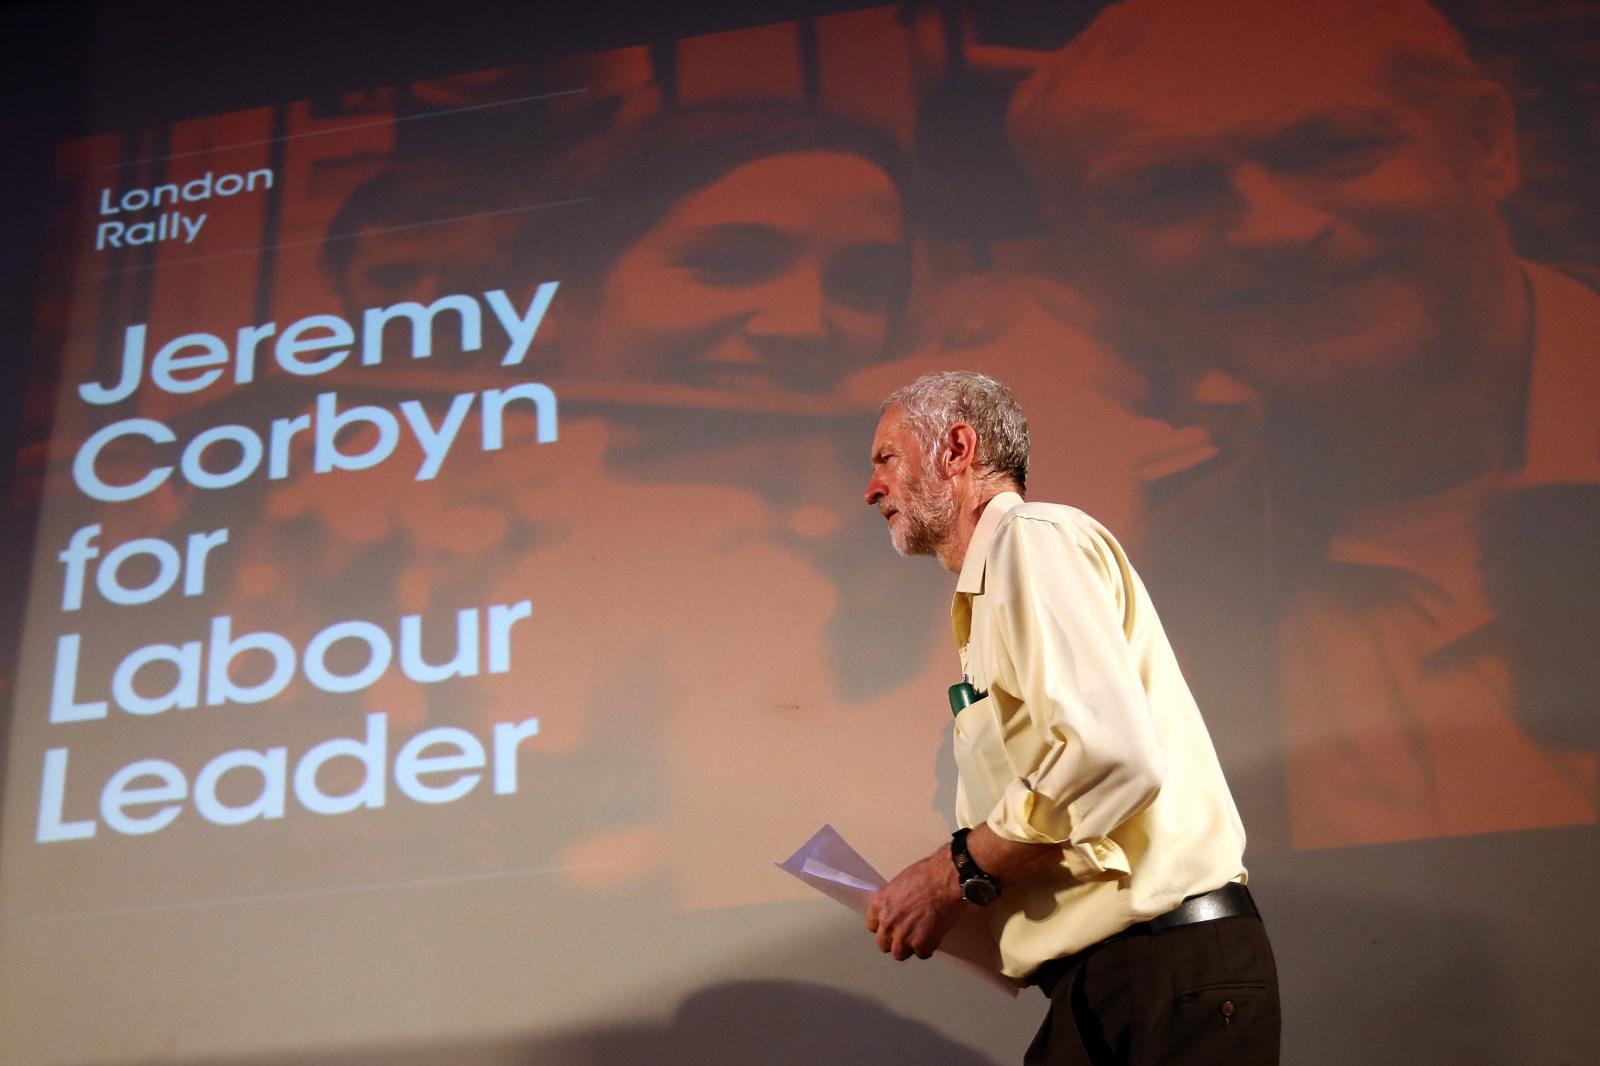 Jeremy Corbyn London